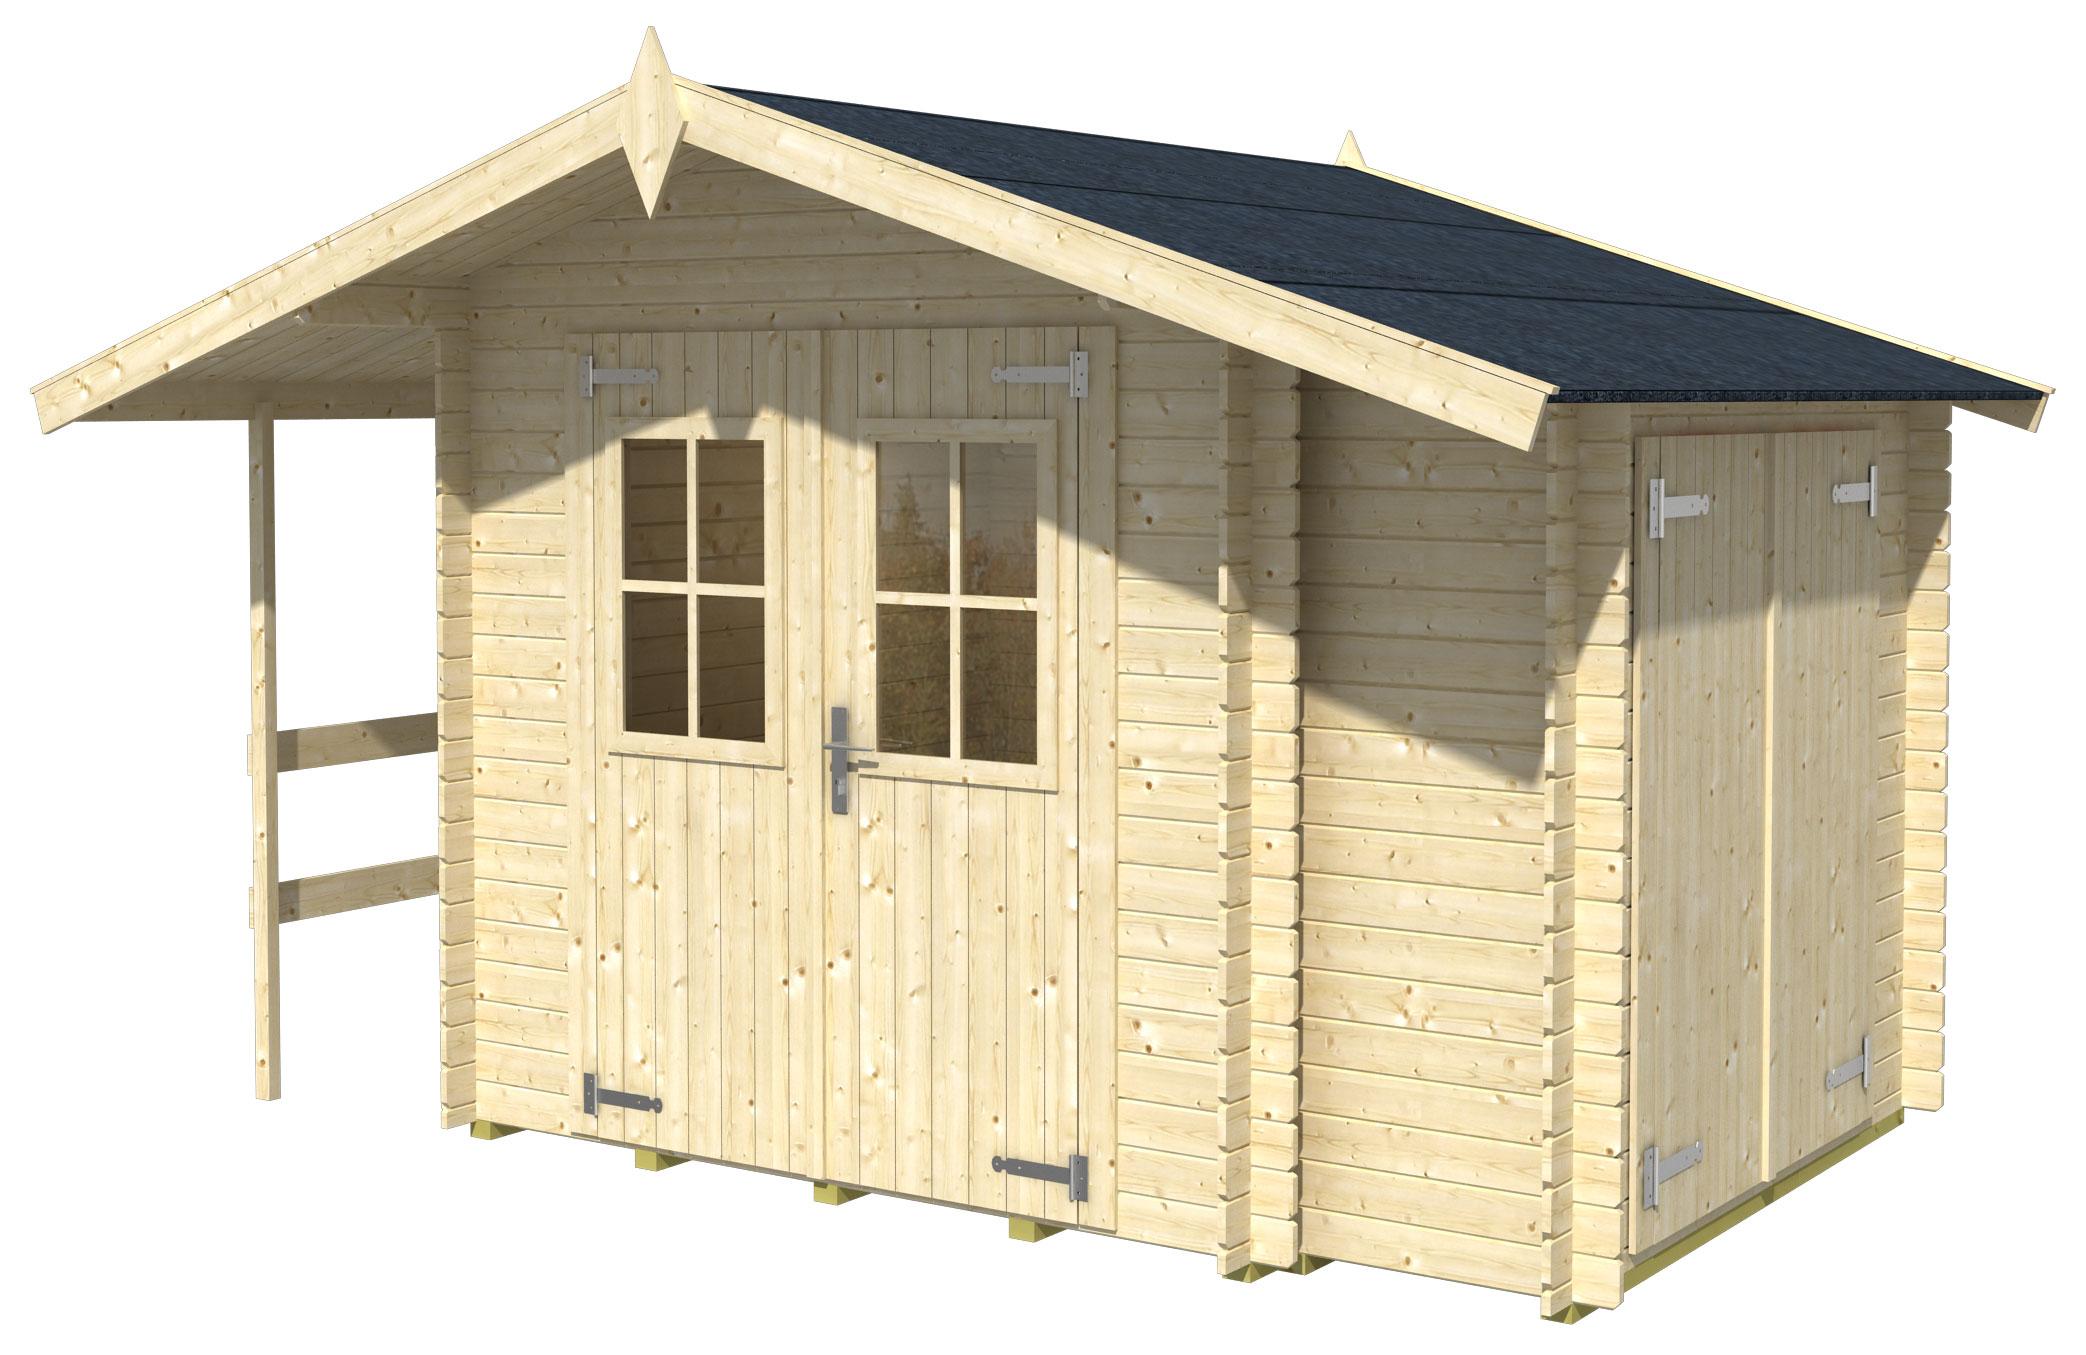 gartenhaus vilano 1 online g nstig kaufen. Black Bedroom Furniture Sets. Home Design Ideas